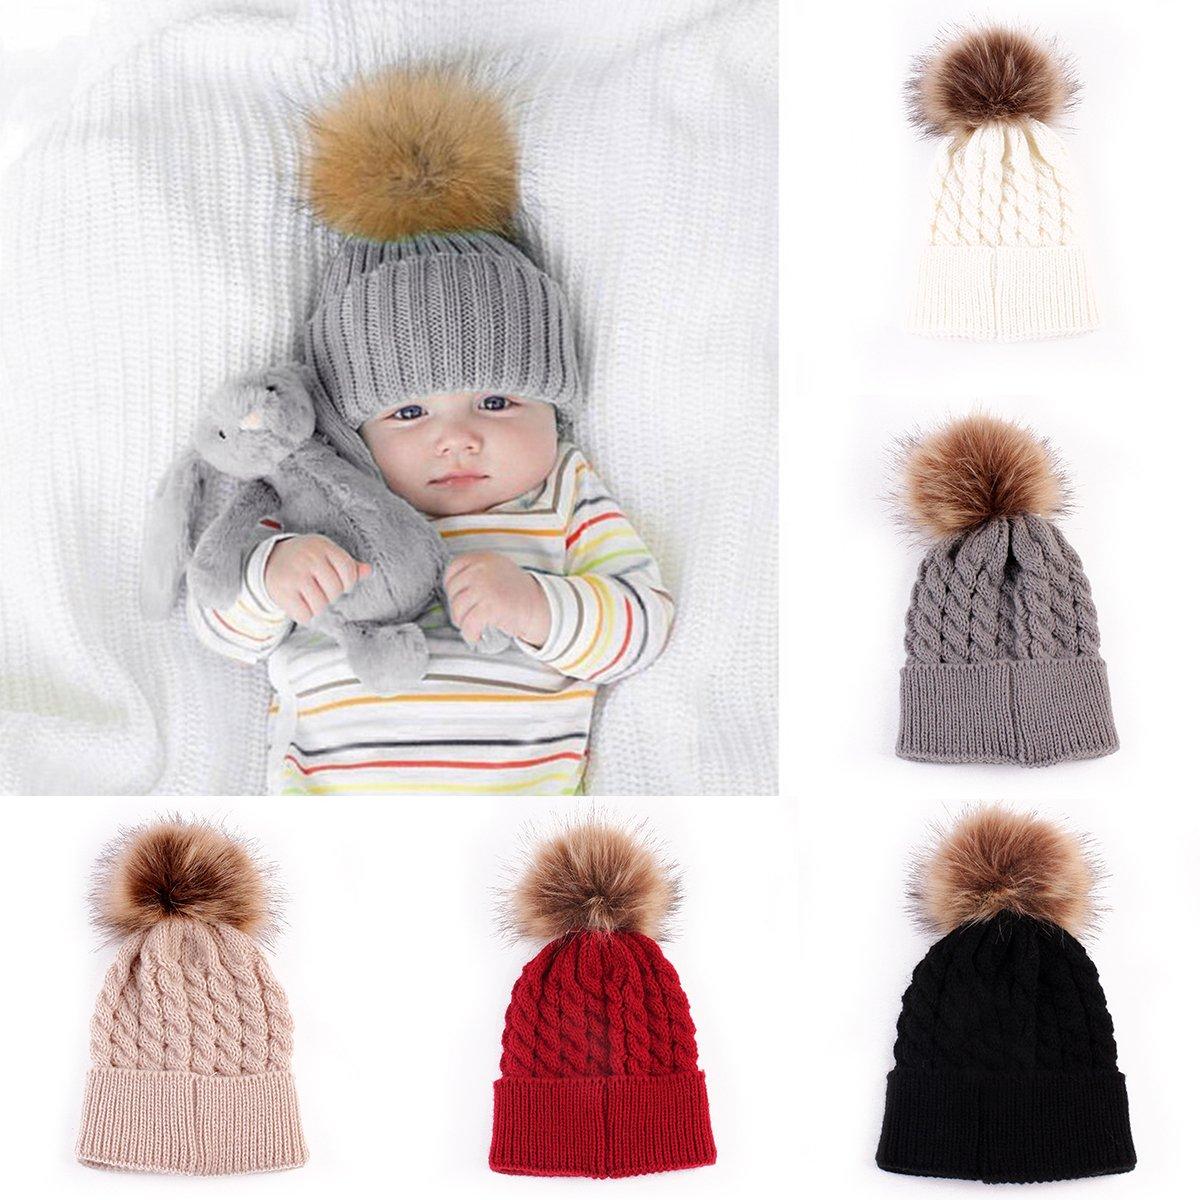 oenbopo Baby Winter Warm Knit Hat Infant Toddler Kid Crochet Hairball Beanie Cap